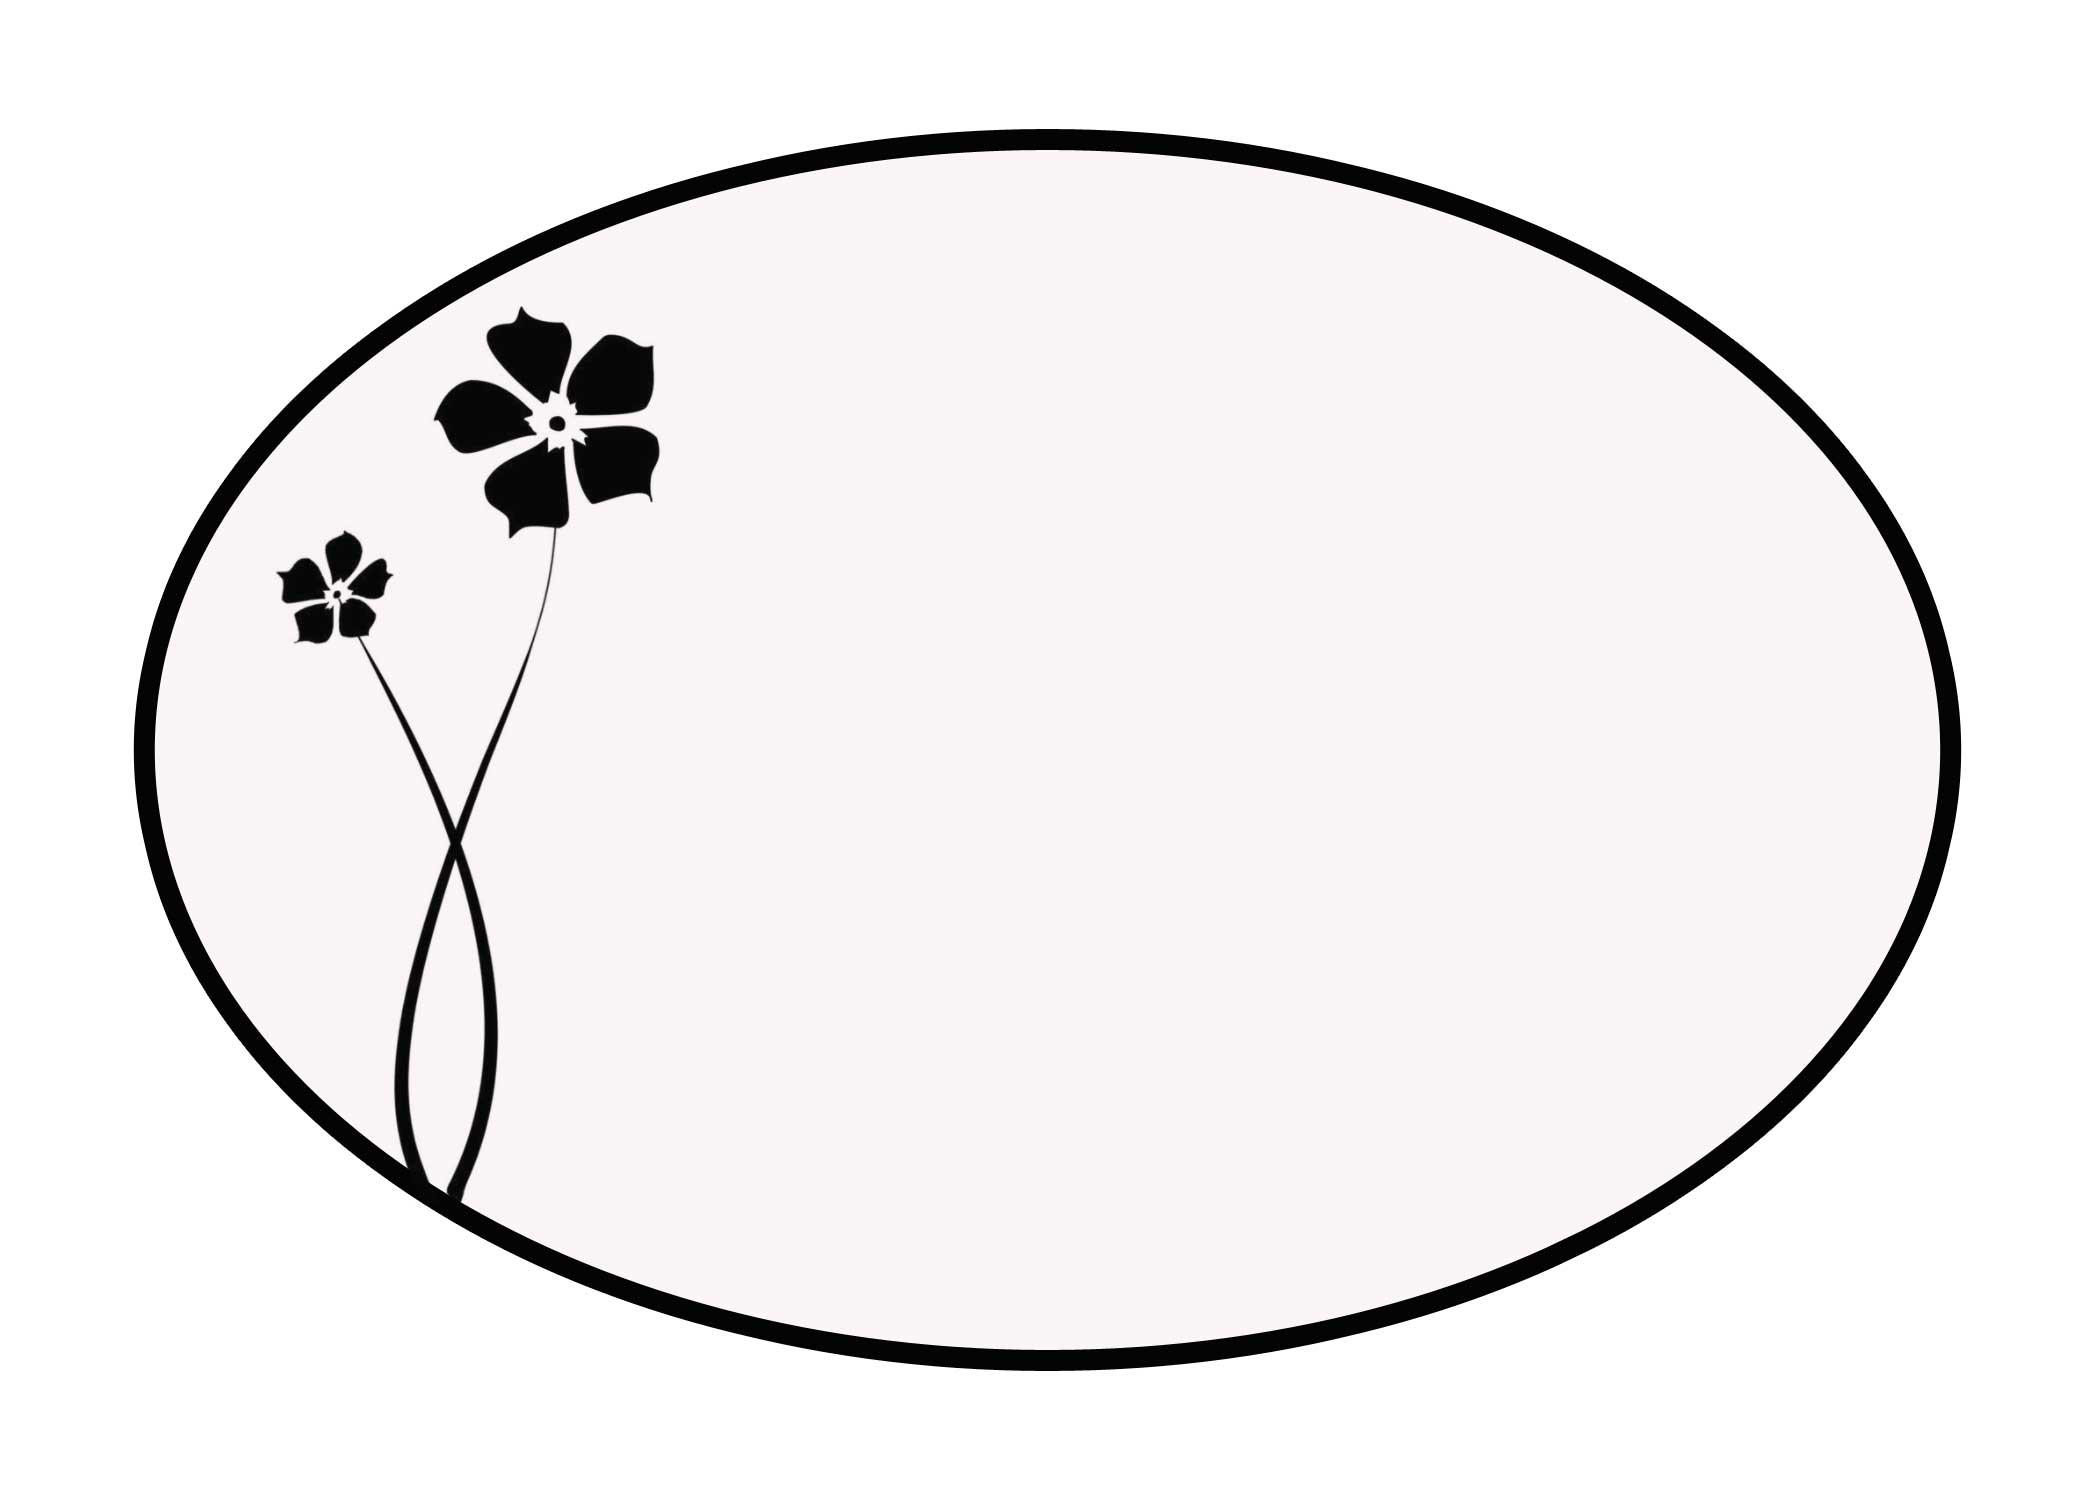 Egg Shaped Clipart